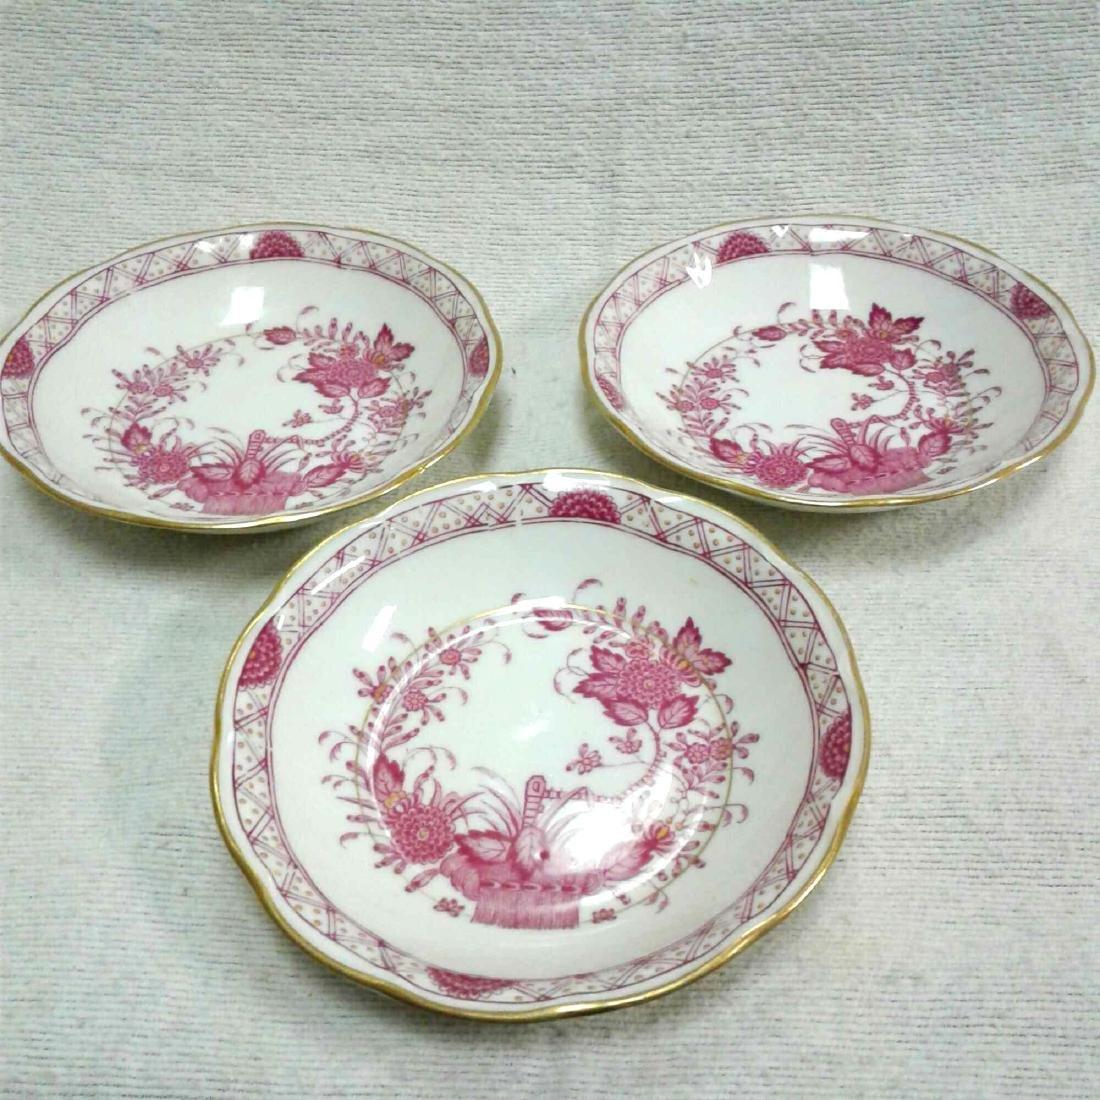 3 Theodore Haviland Dessert Plates